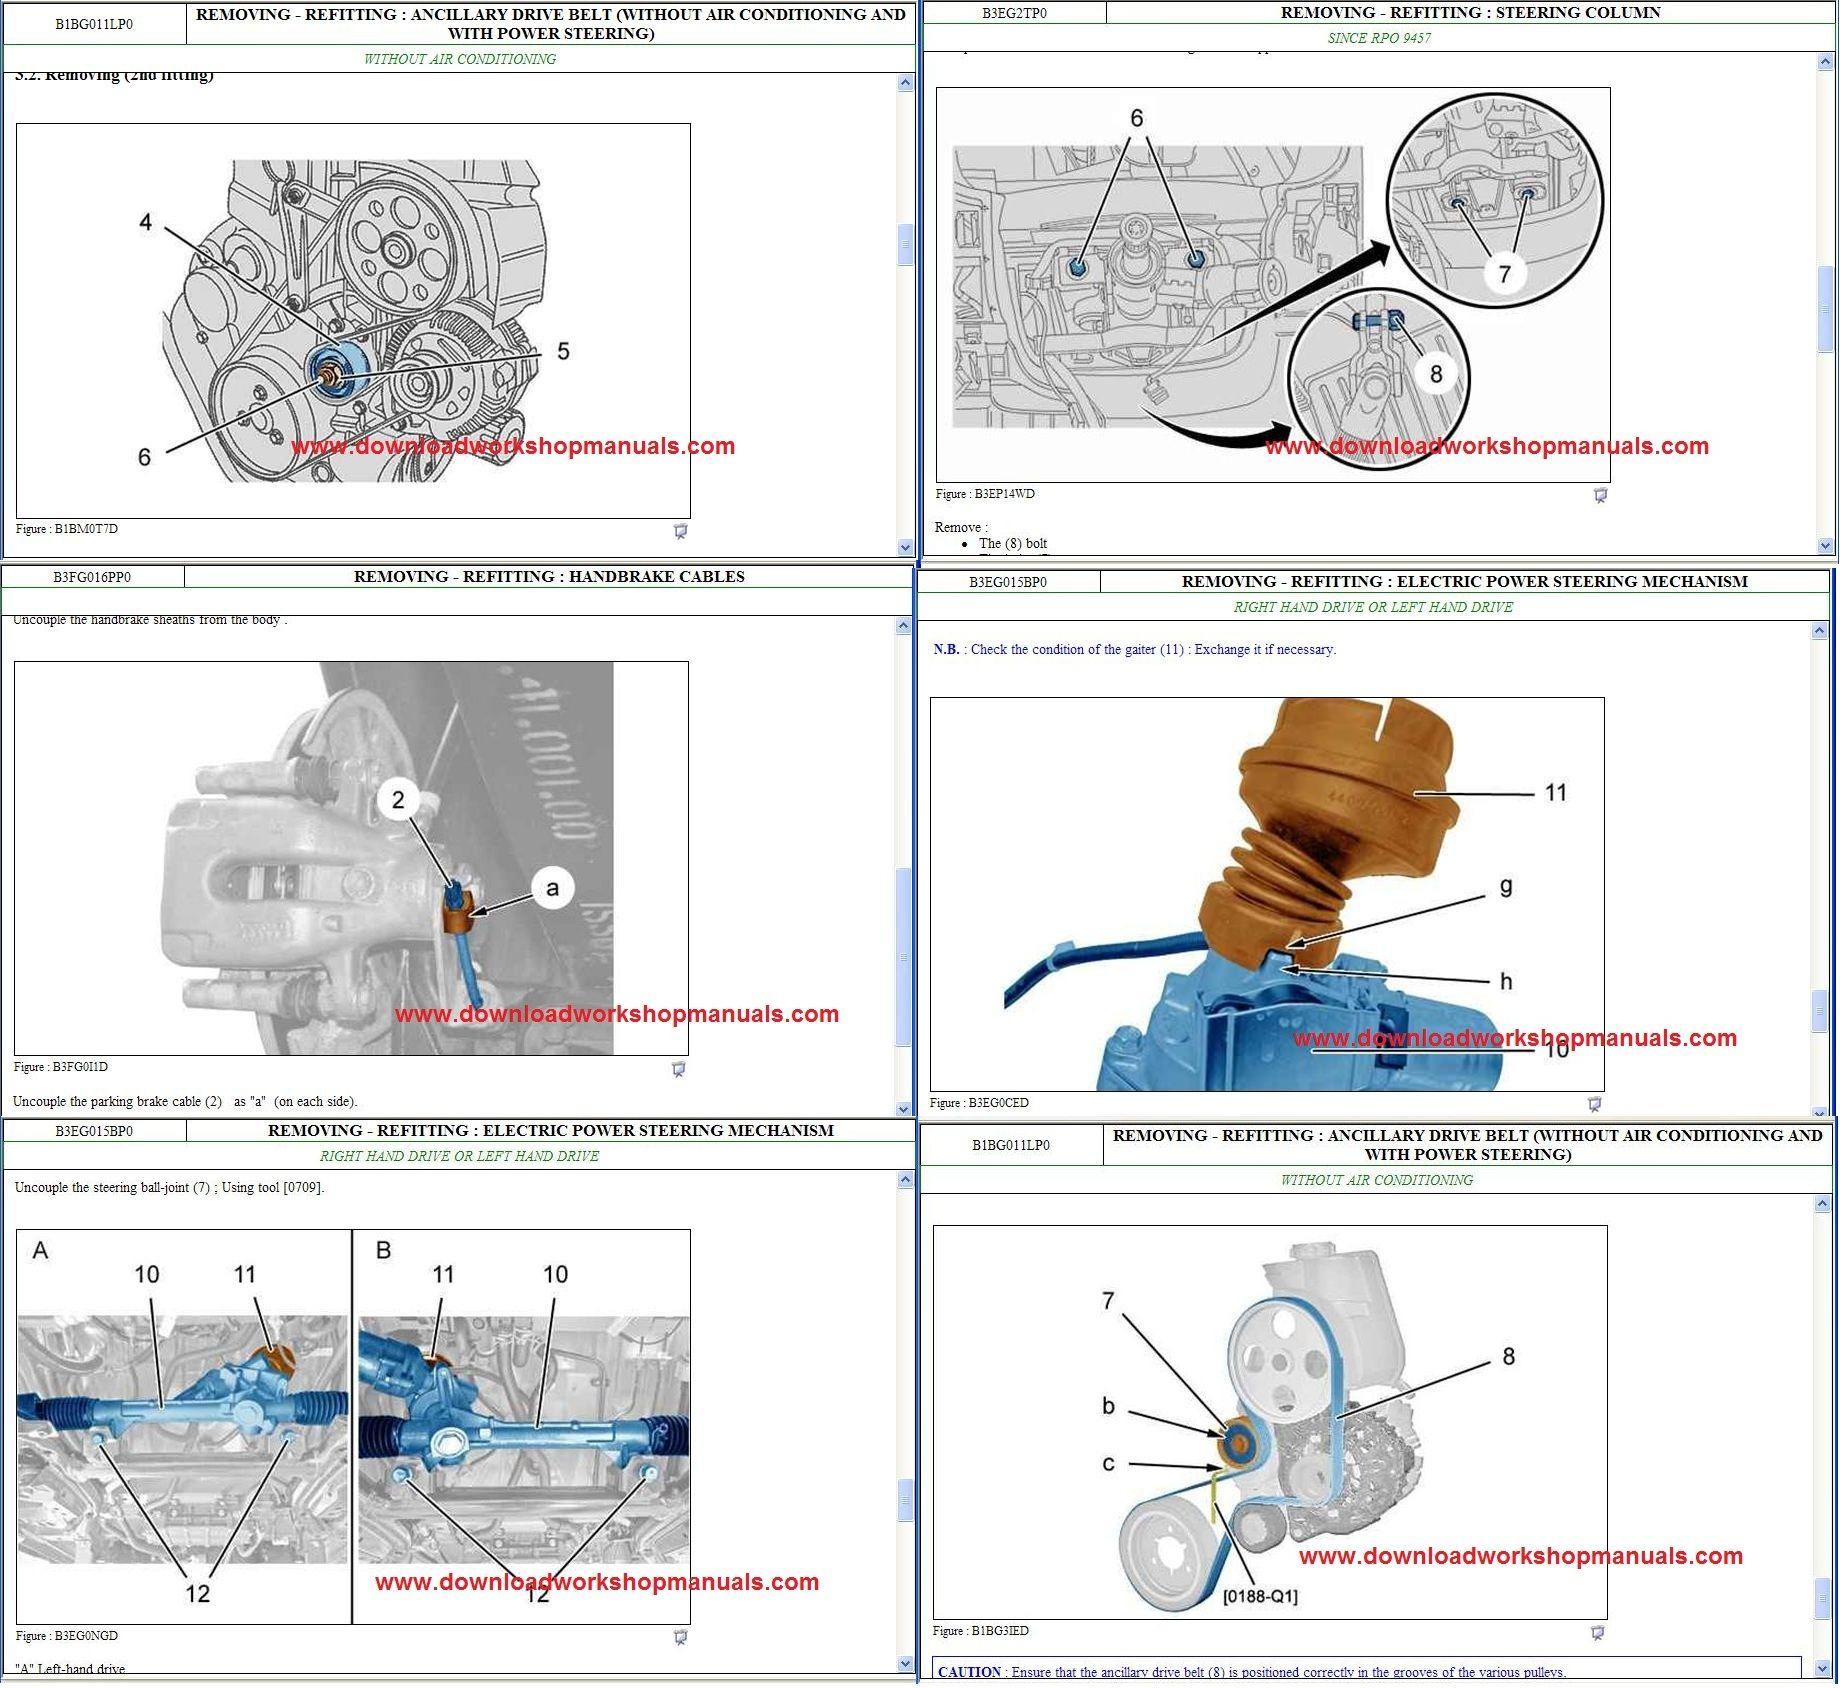 Citroen Synergie Wiring Diagram Download - 1997 F 150 Fuse Box -  cheerokee.yenpancane.jeanjaures37.fr | Citroen Synergie Wiring Diagram |  | Wiring Diagram Resource